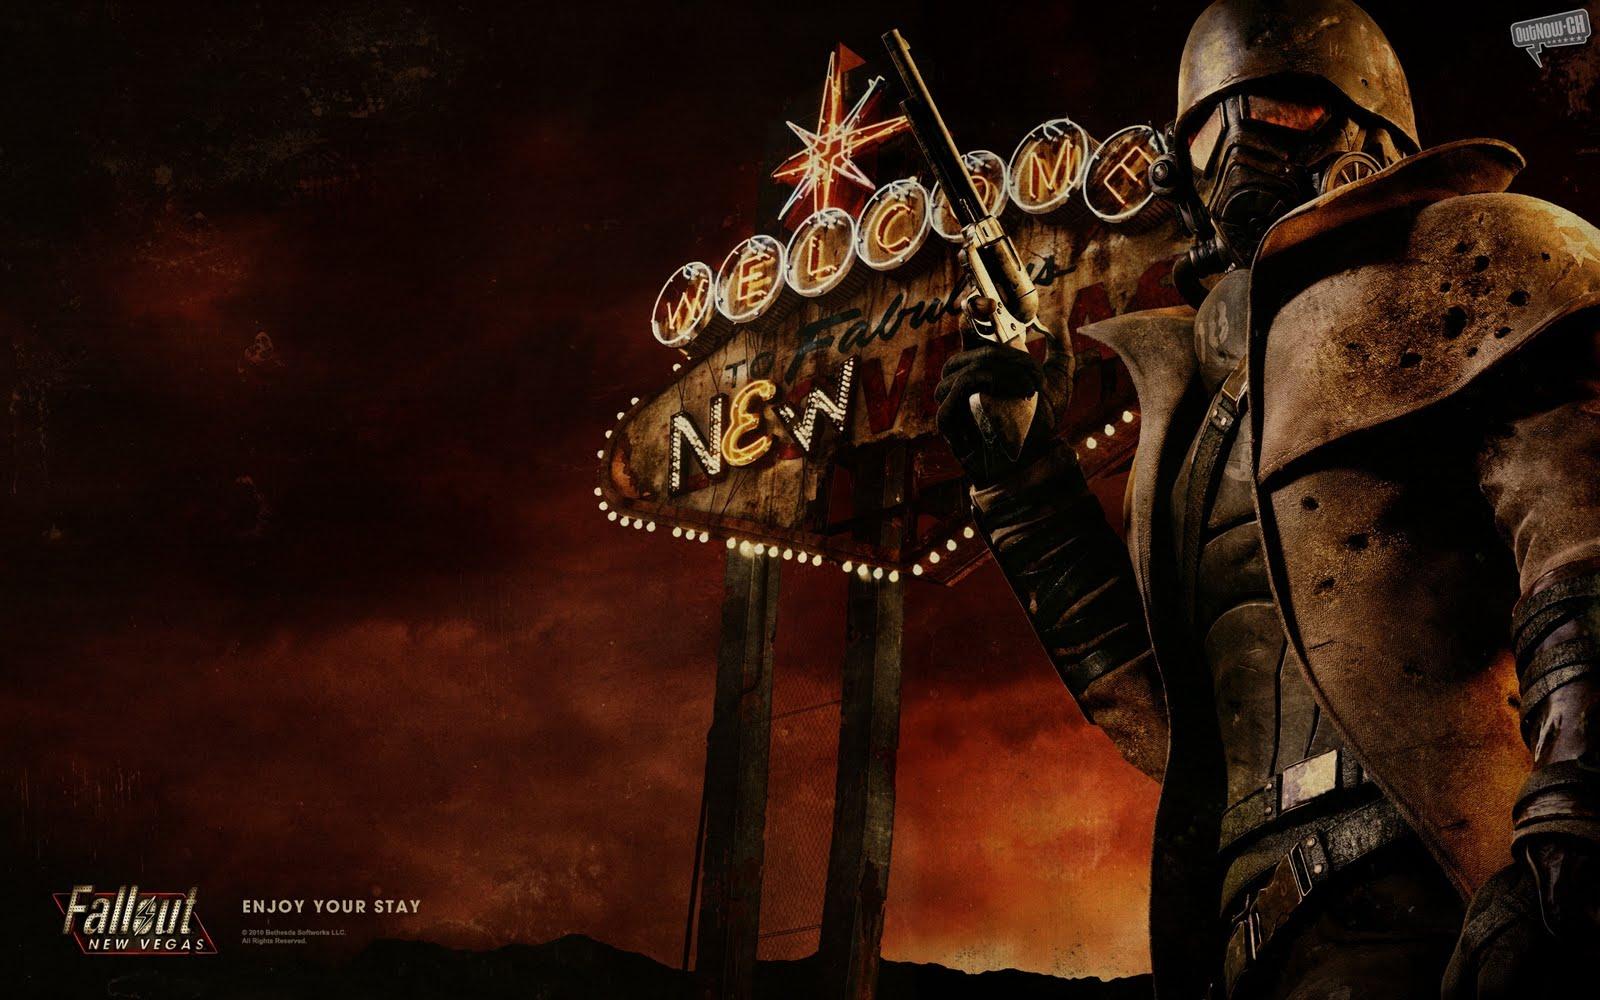 http://3.bp.blogspot.com/-jPmZr2oHOik/TdK3PyYY8CI/AAAAAAAABvk/LAp9RbctBME/s1600/Fallout_new_vegas_5.jpg